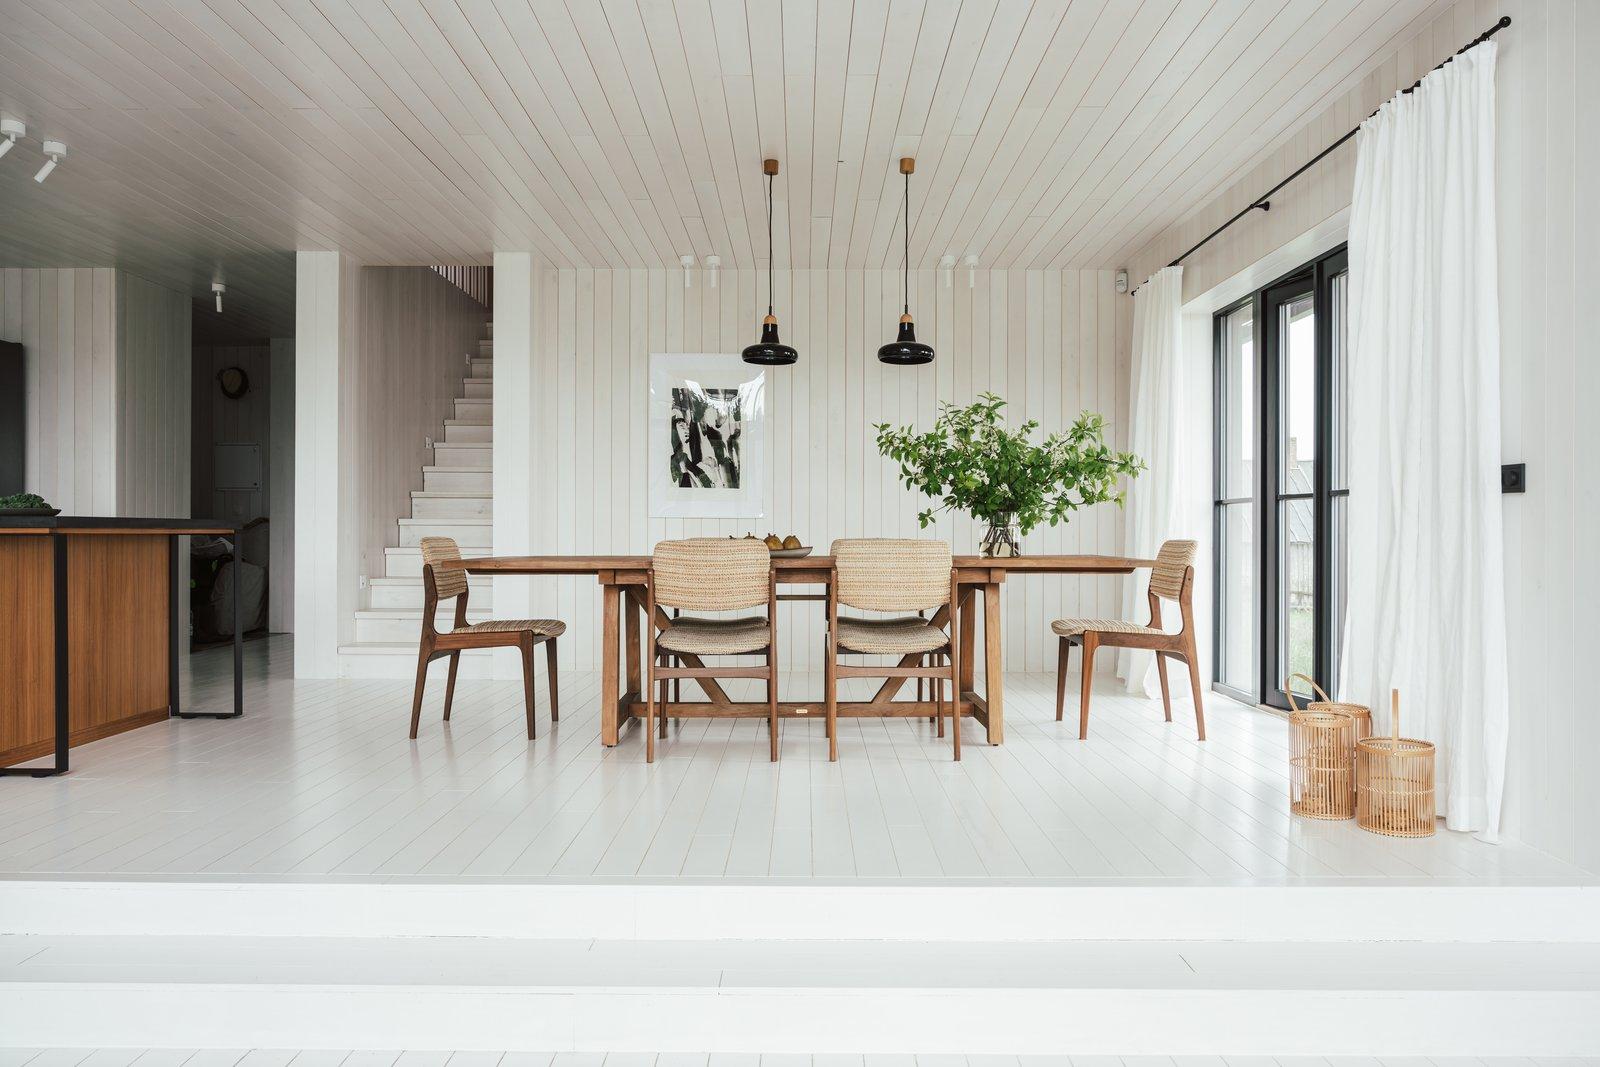 Fisherman's Cottage Hanna Karits dining room